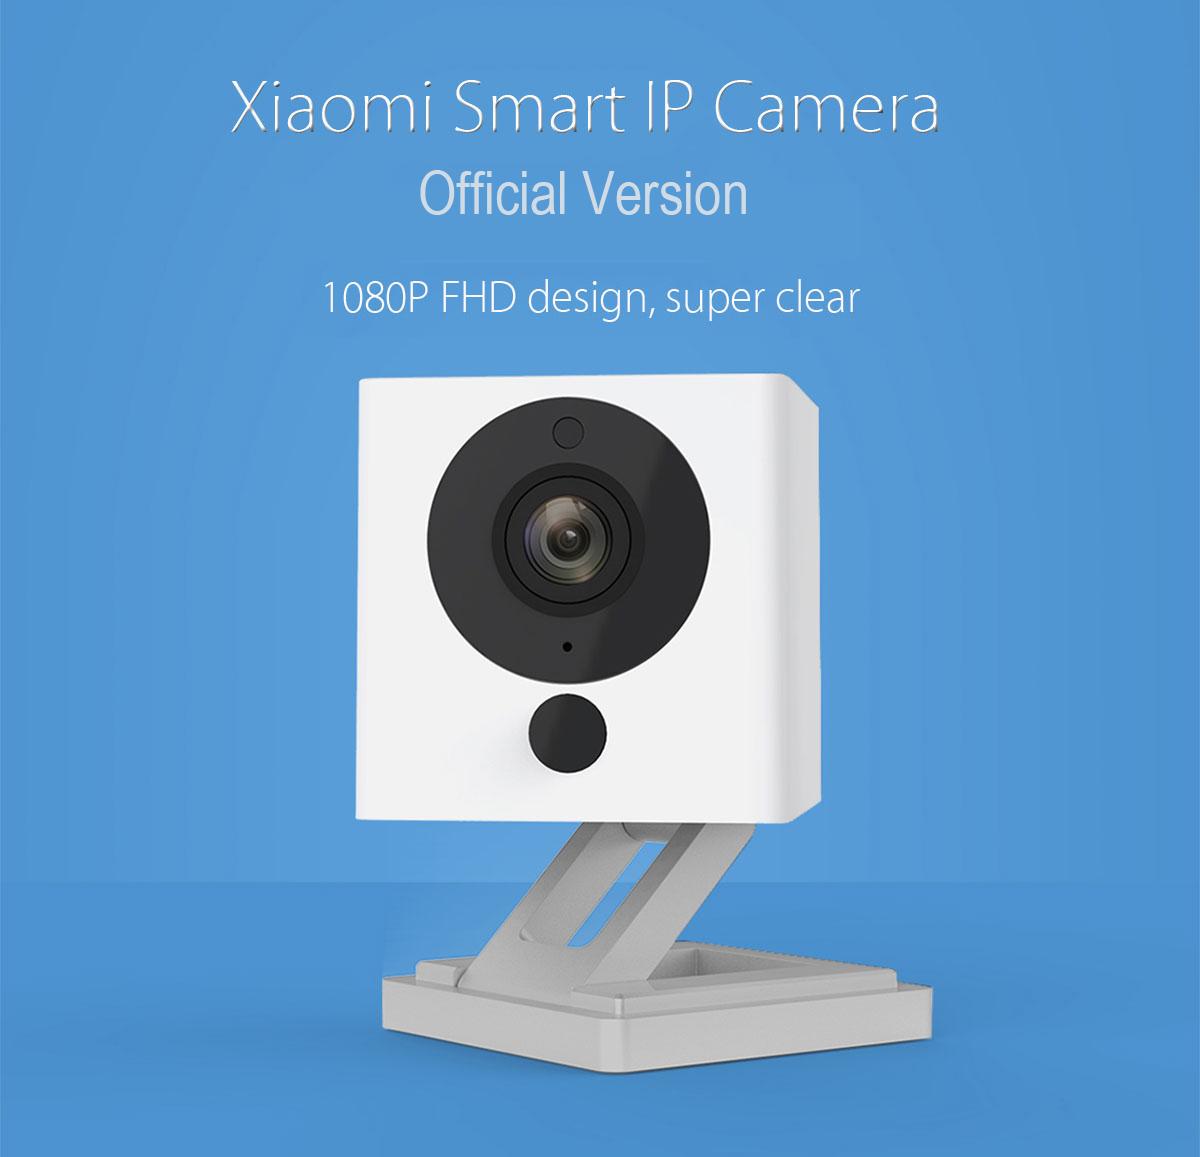 Xiaomi Square Smart IP Camera - กล้องวงจรปิด Xiaomi 1080P